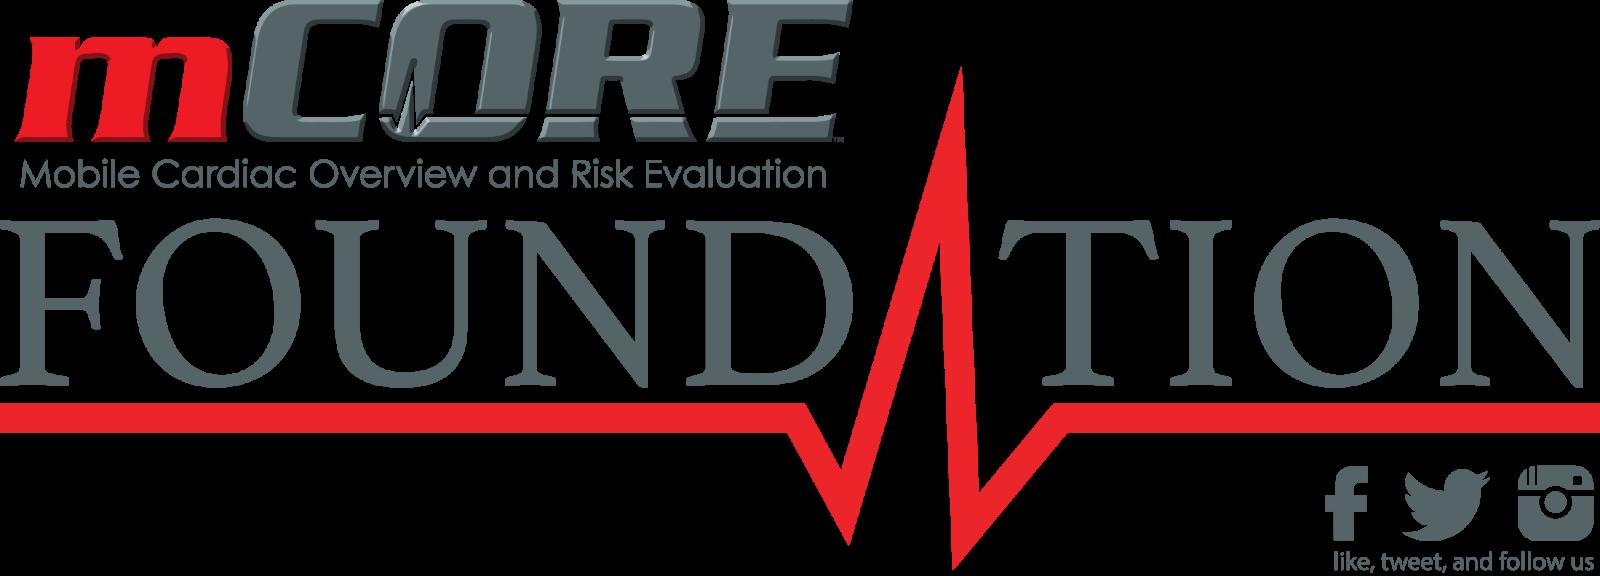 mCORE Cardiac Screening Opportunity on 8/23/19